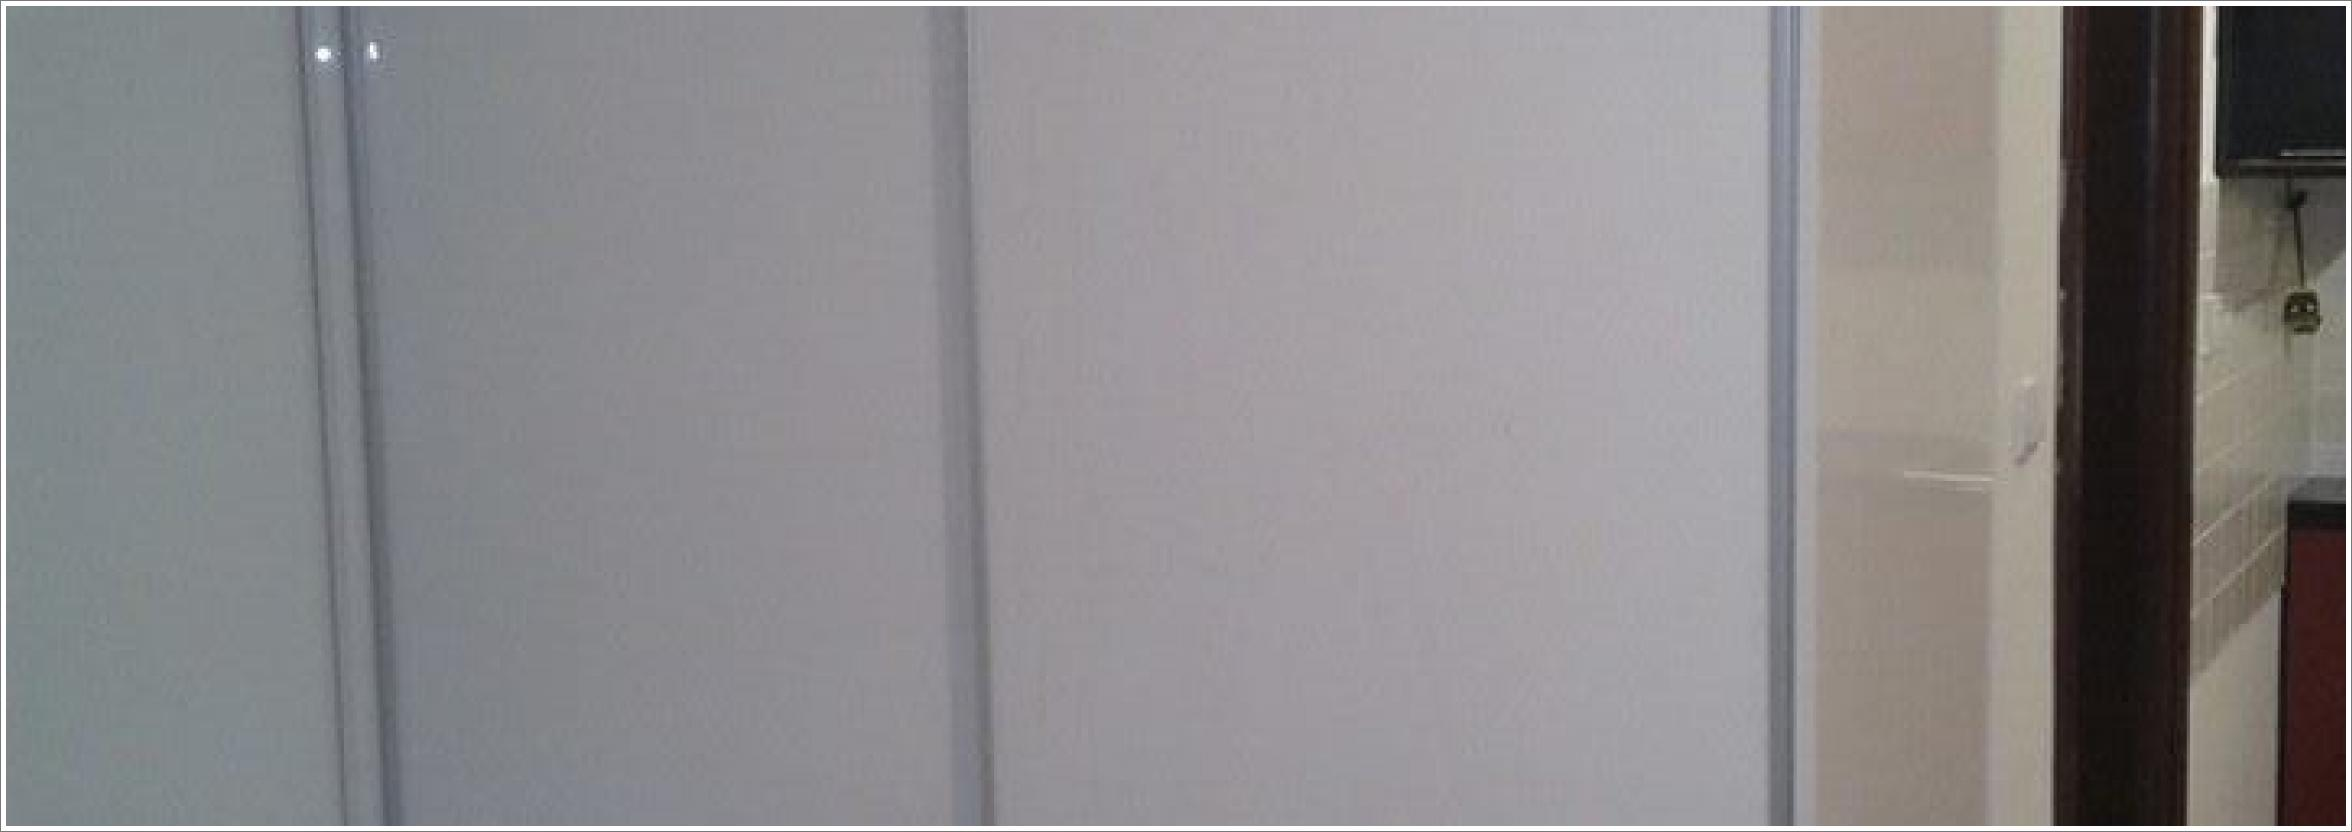 dvokrilni ormar sa kliznim vratima - stolarija gavrilovic